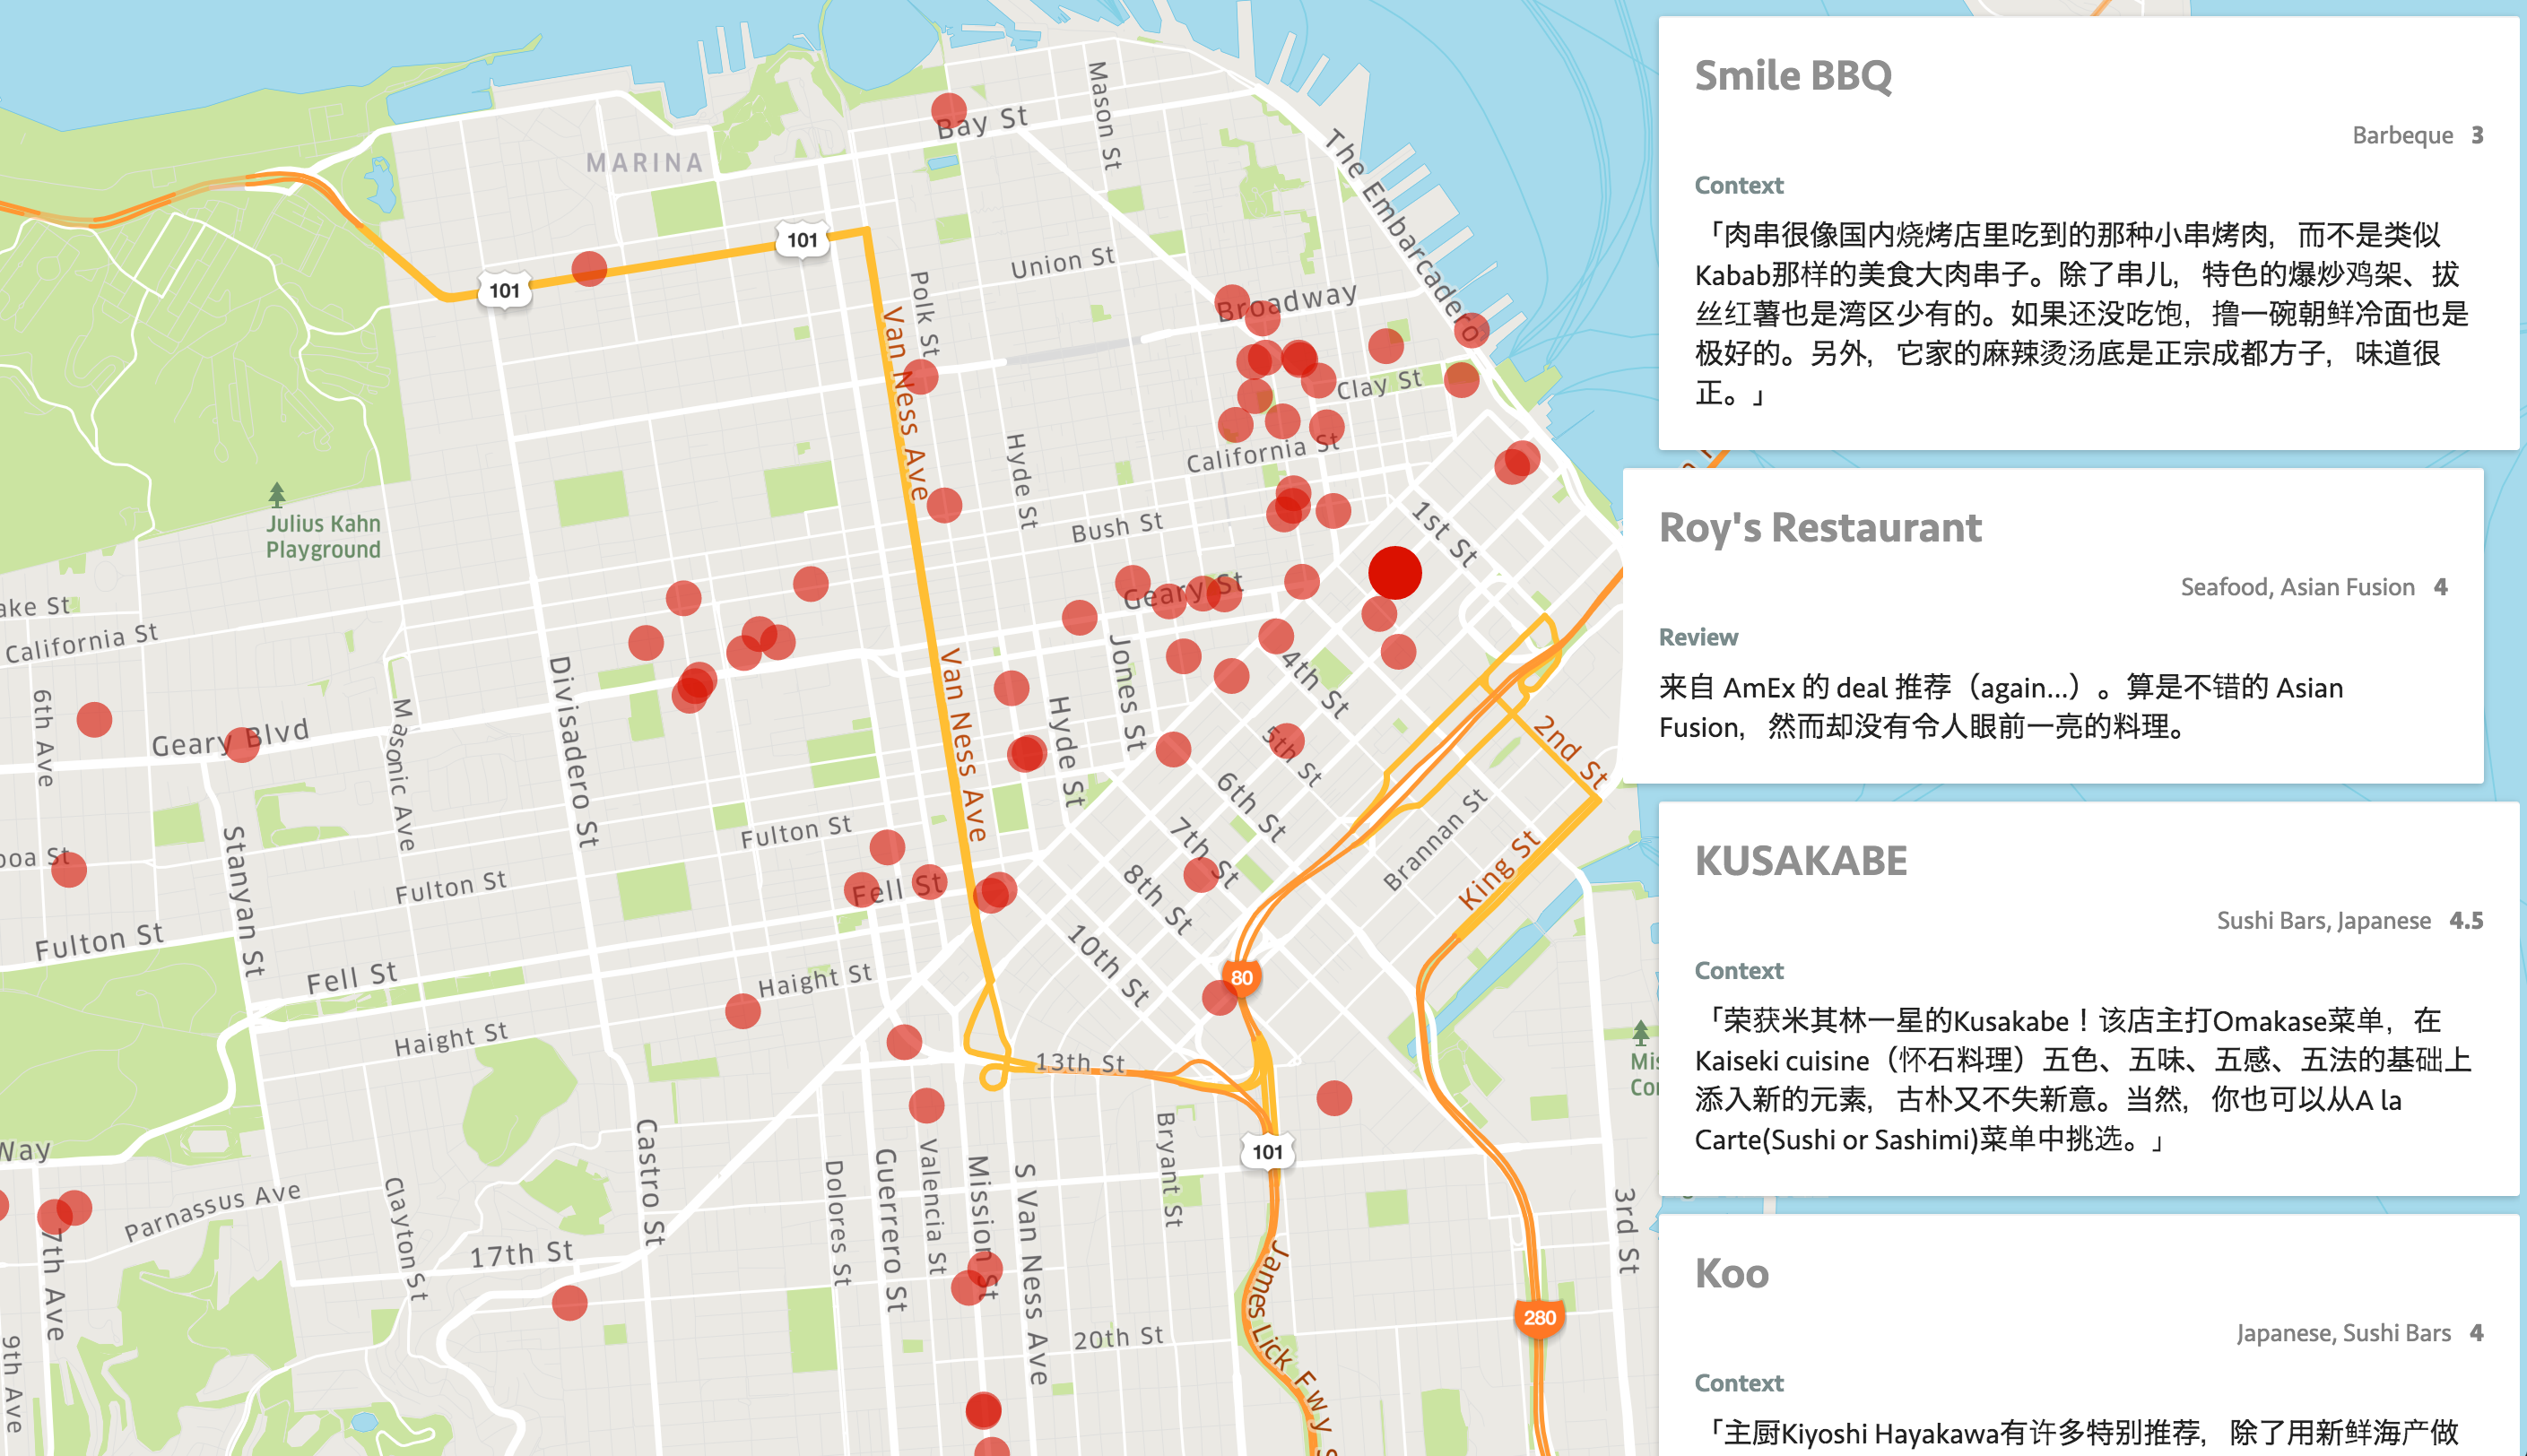 GitHub - junjiah/ybk-map: Show my yelp bookmarks. on